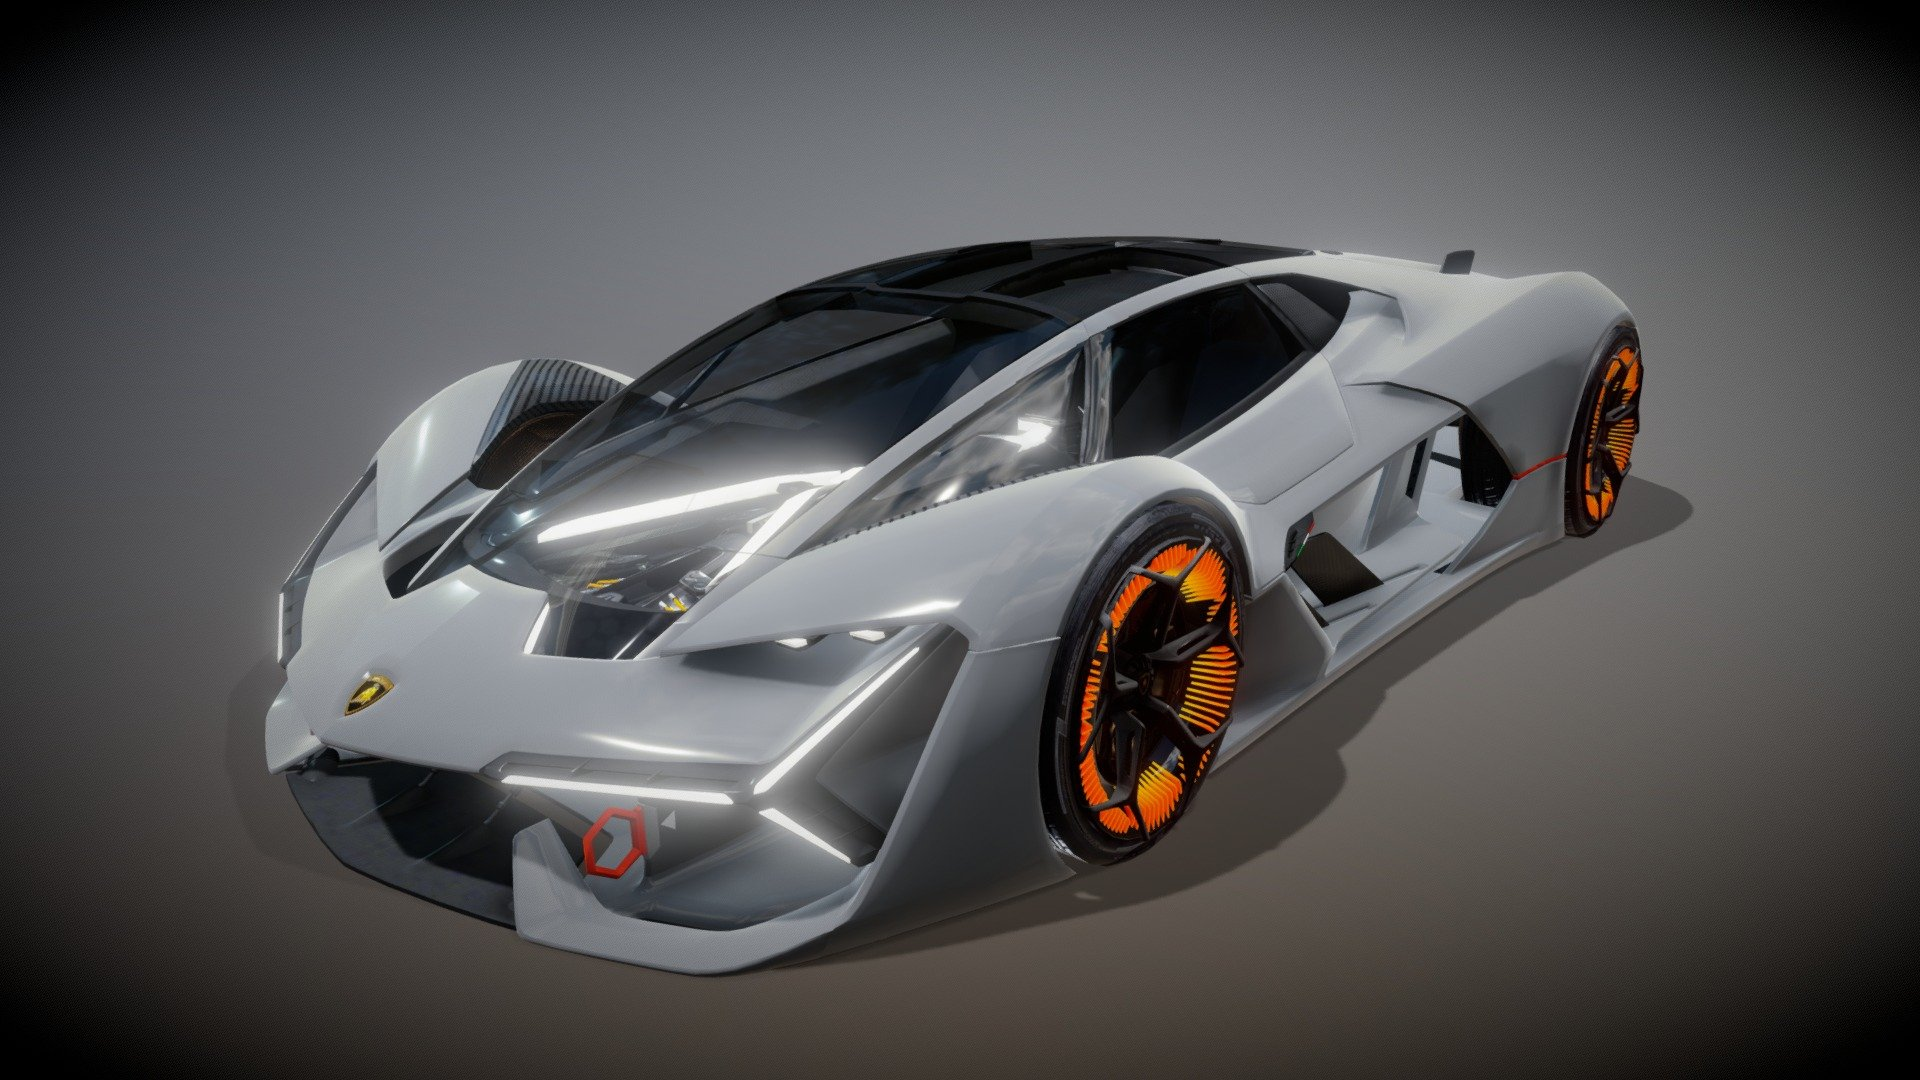 Lamborghini Terzo Millennio 3d Model 1920x1080 Wallpaper Teahub Io